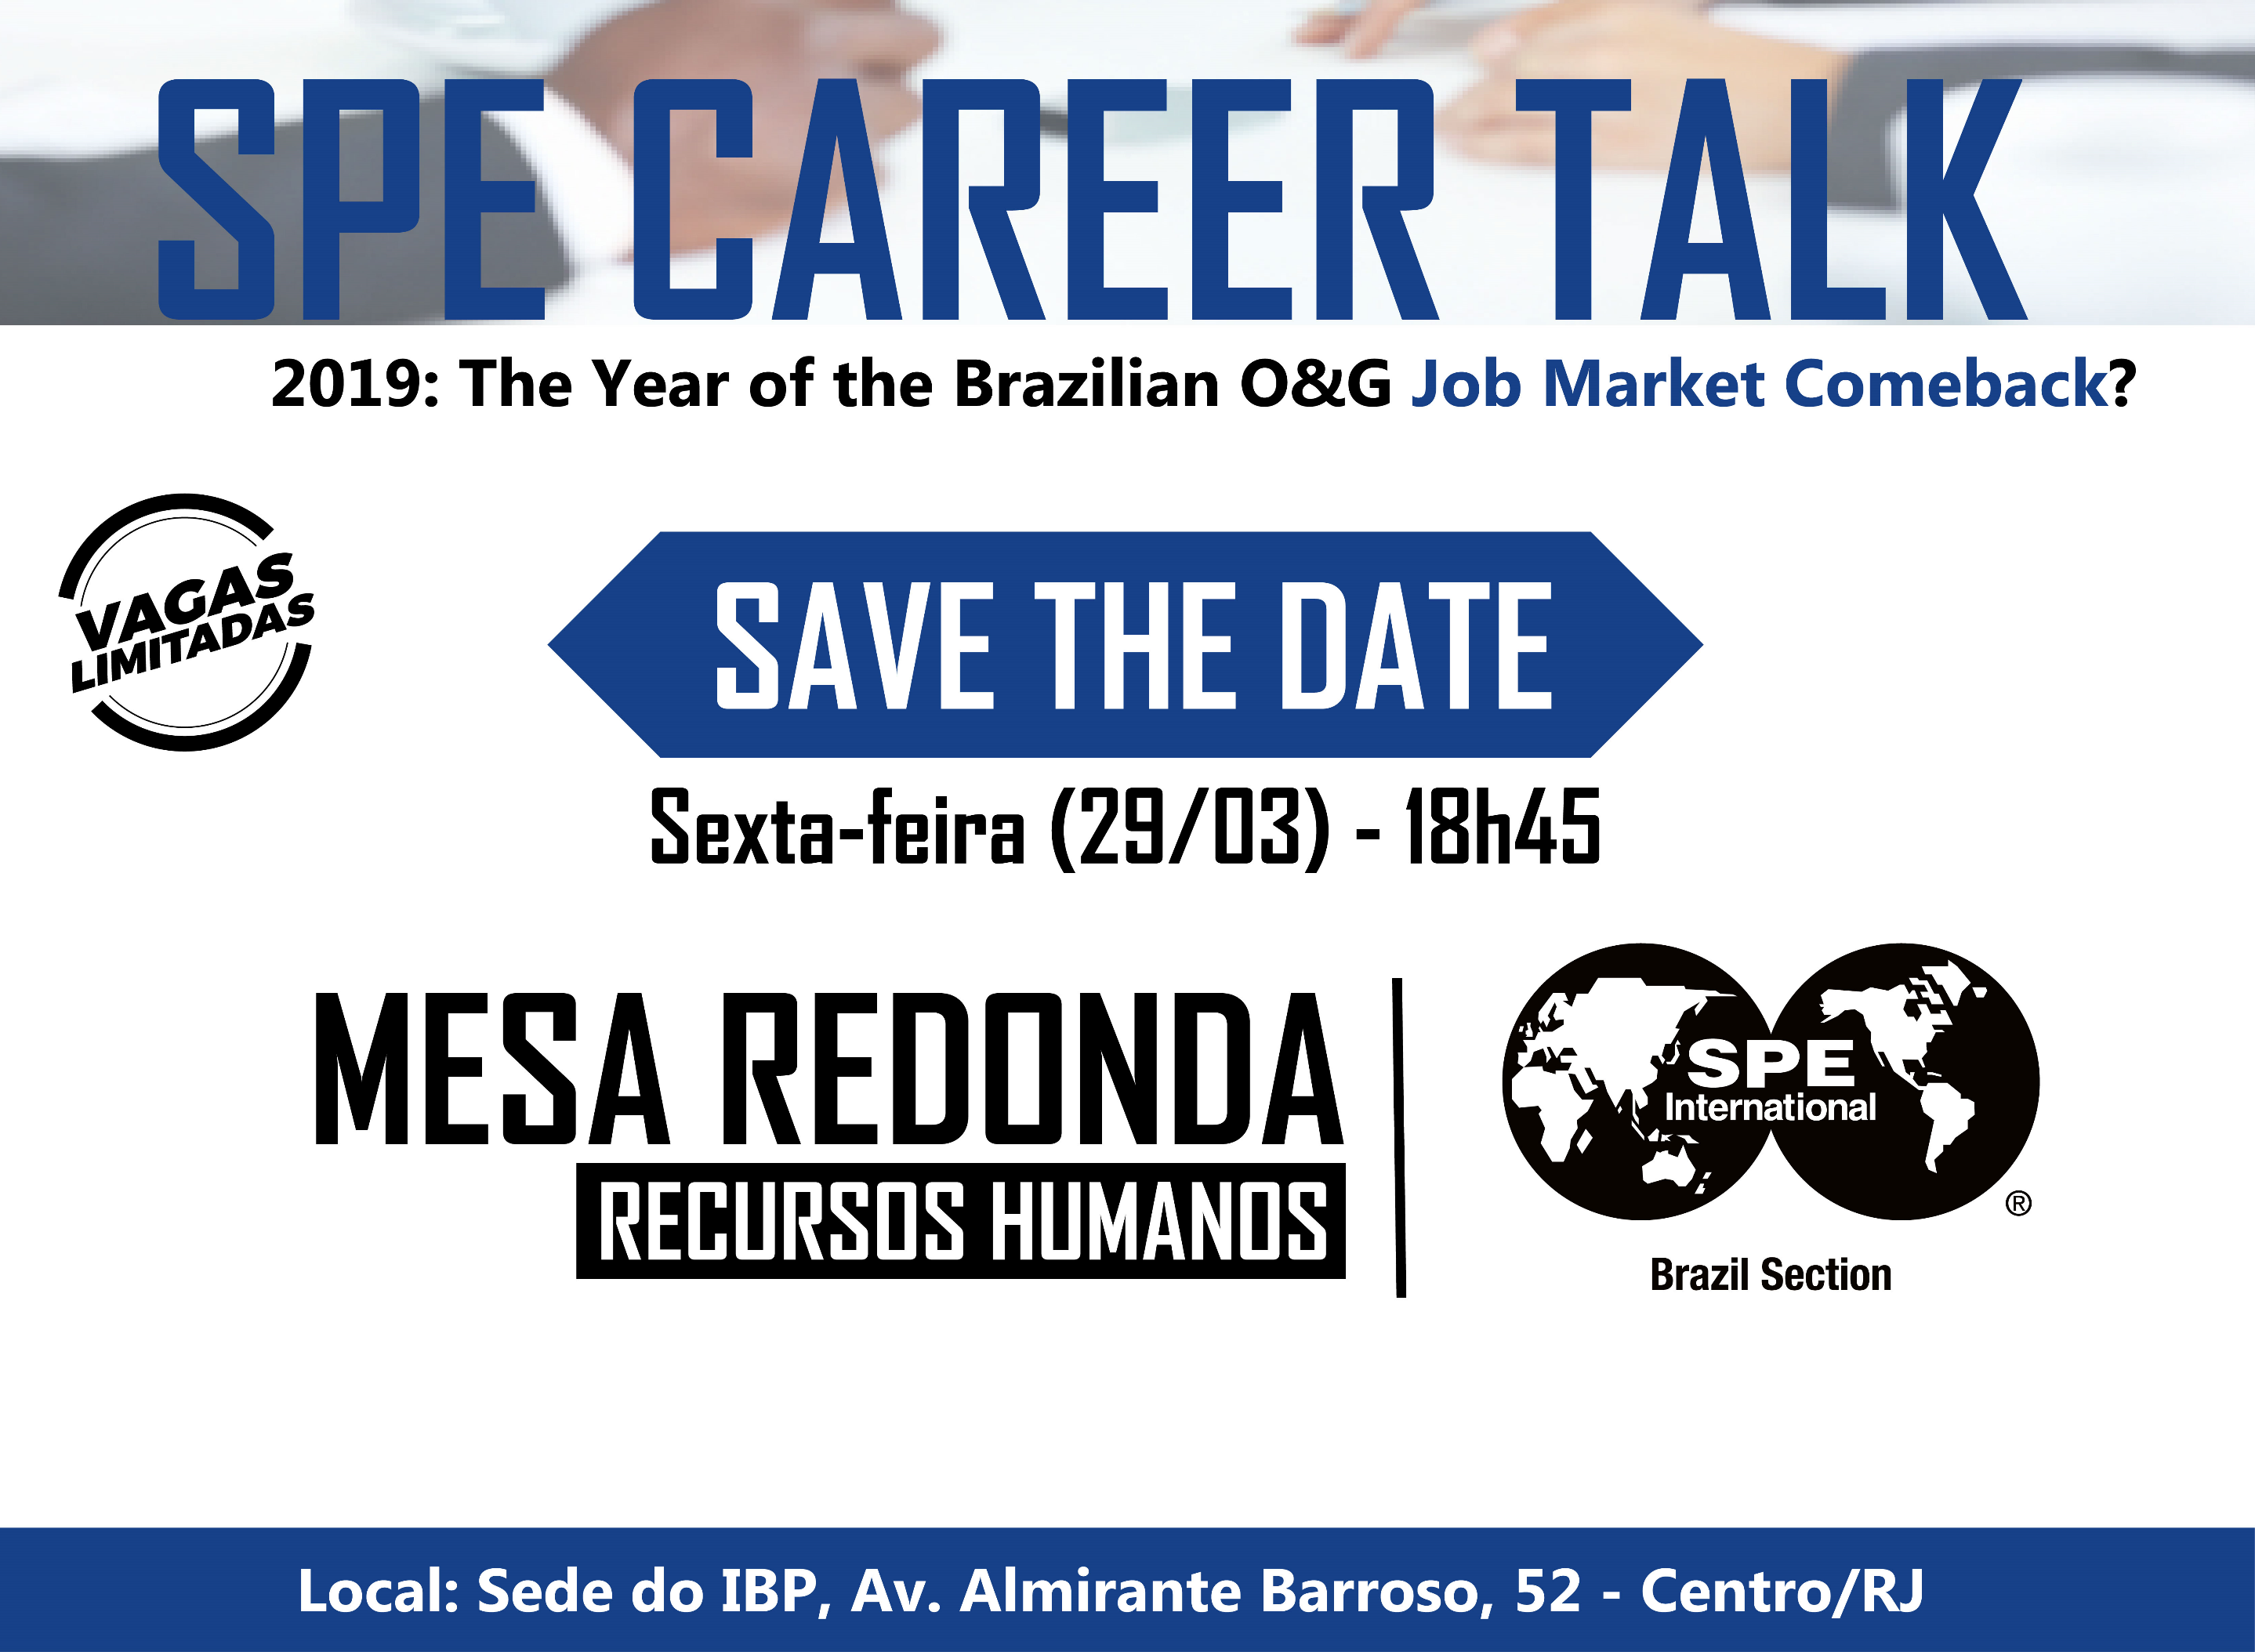 SPE CAREER TALK. 2019: The year of the Brazilian O&G Job Market Comeback?